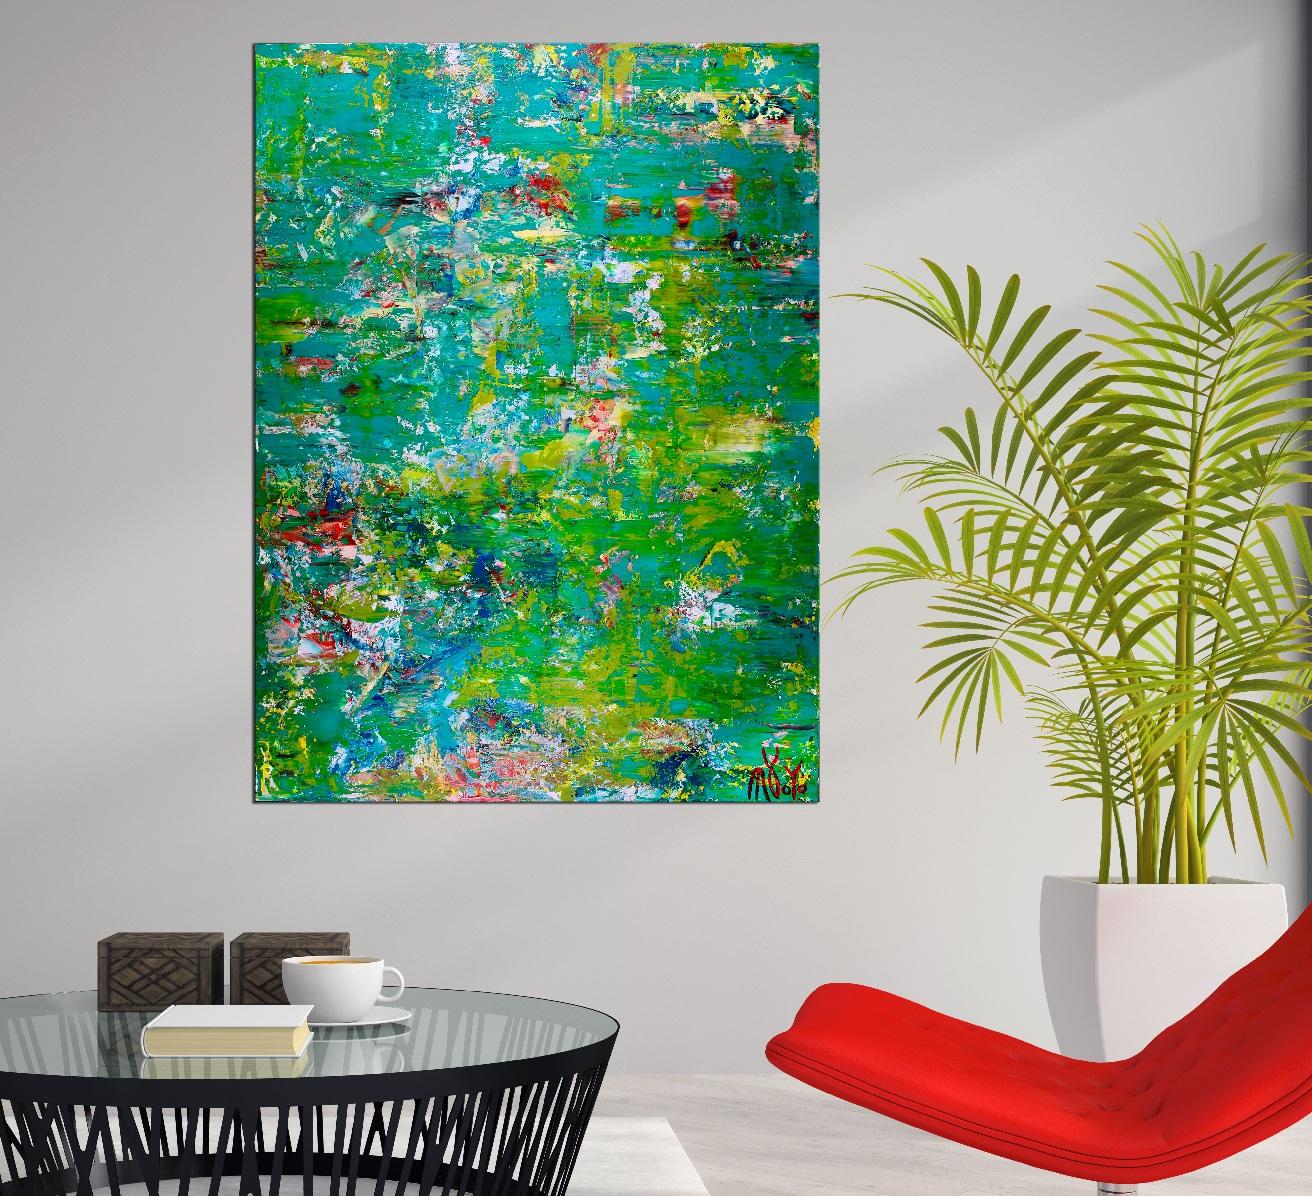 Room View - Enchanted Greenery (Verdor encantado) by Nestor Toro